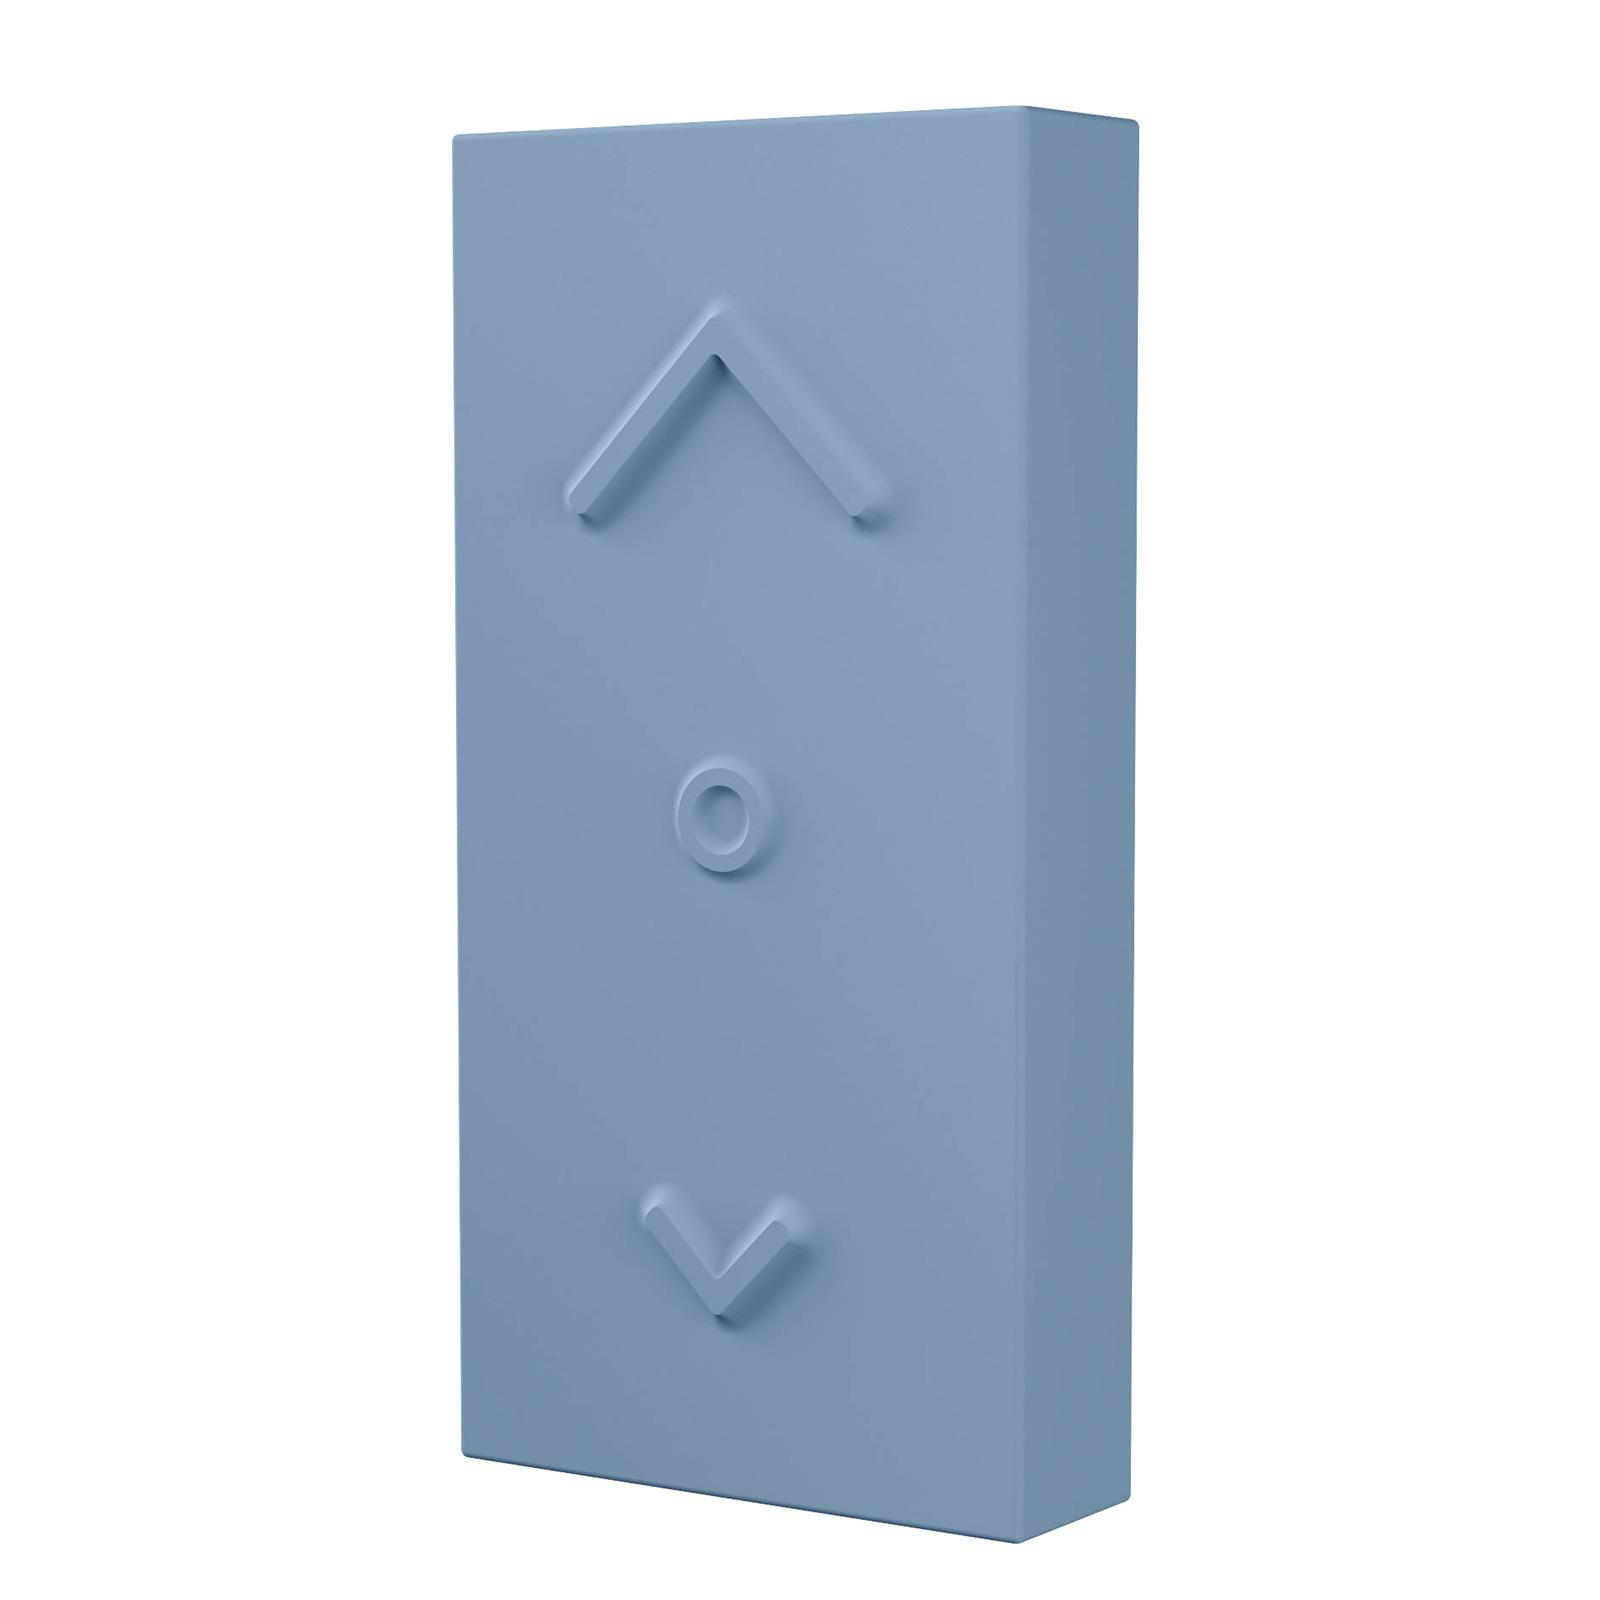 LEDVANCE SMART+ ZigBee Switch Mini blau